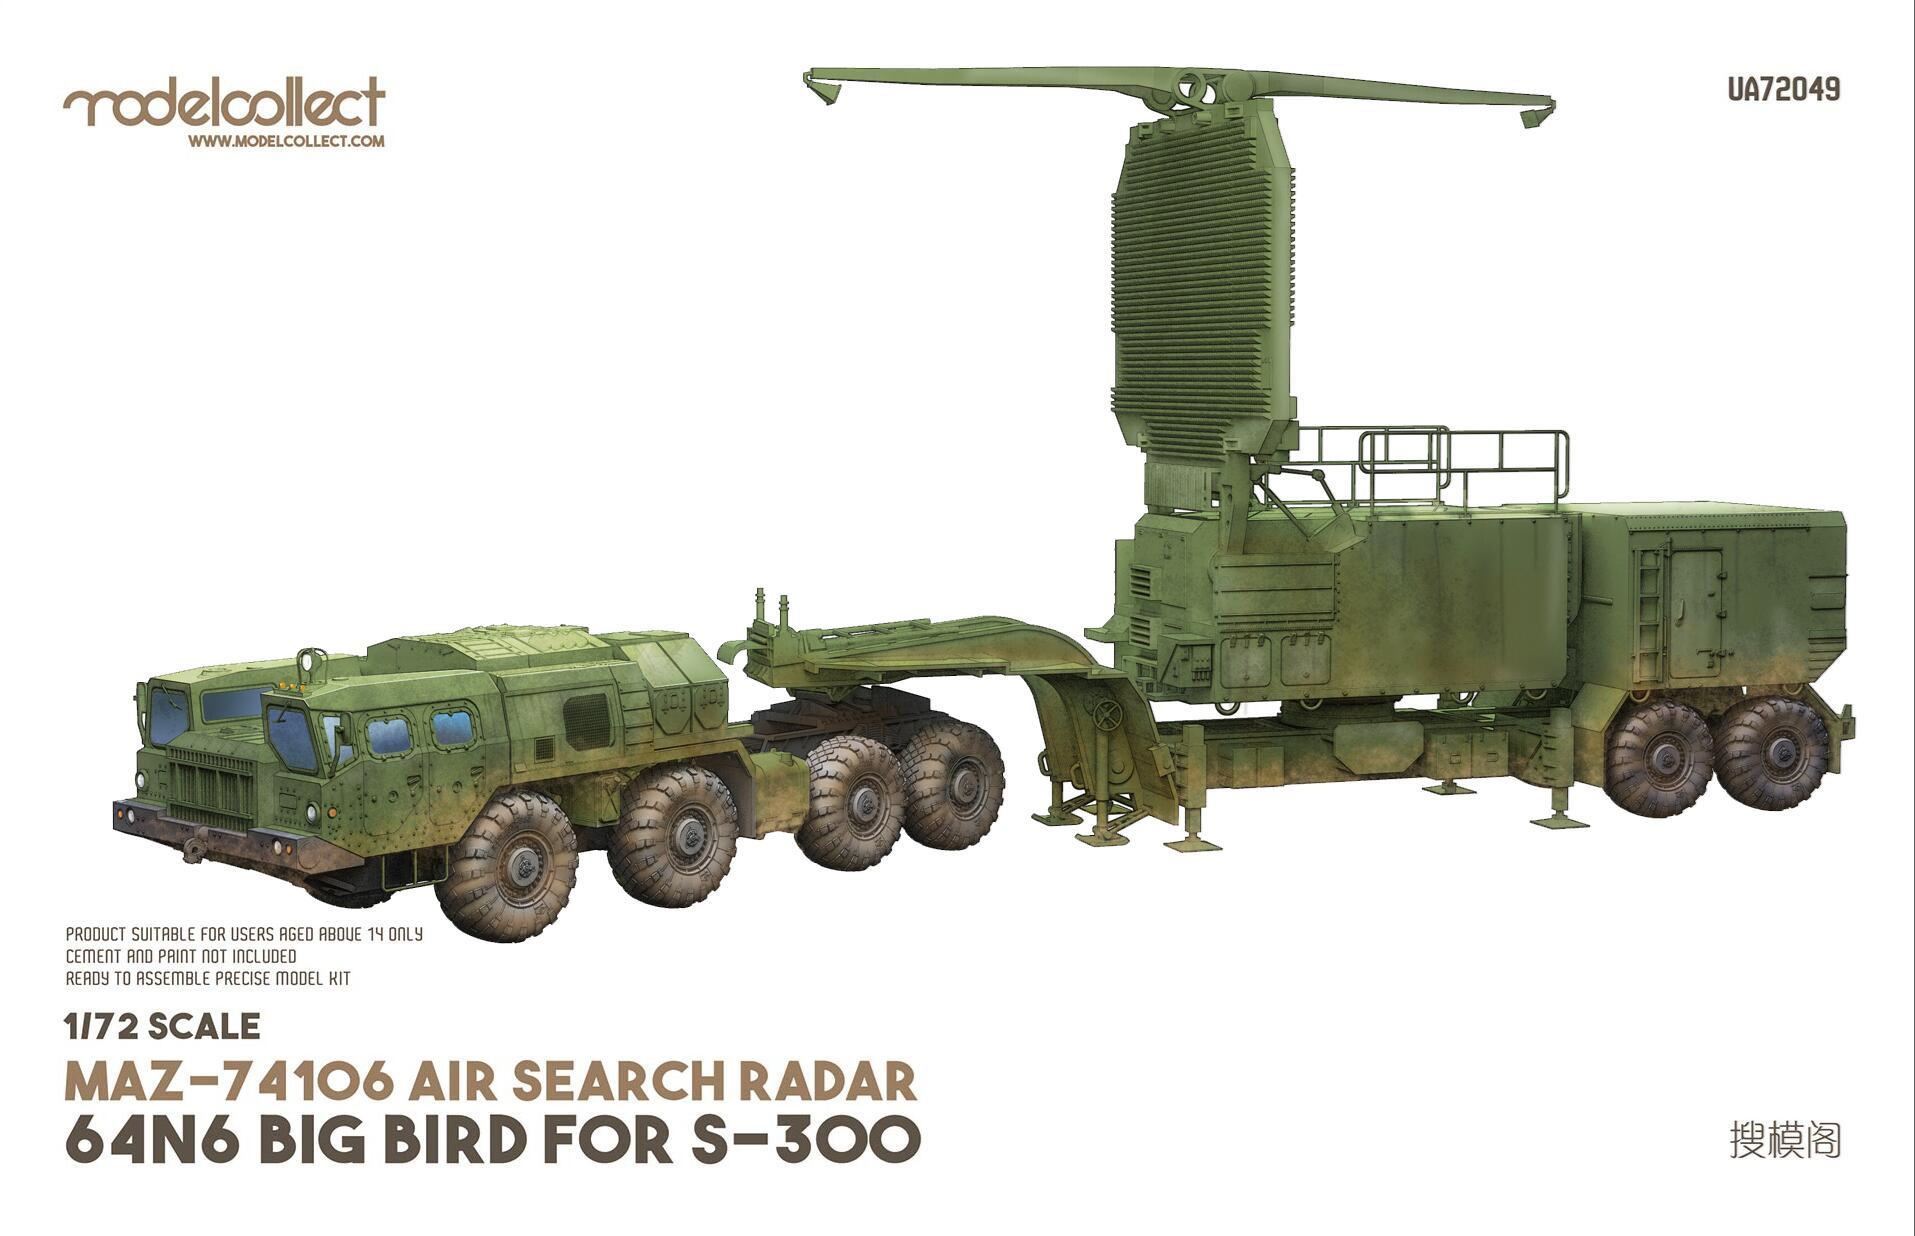 ModelCollect MAZ-74106 air search radar 64N6 BIG BIRD for S-300